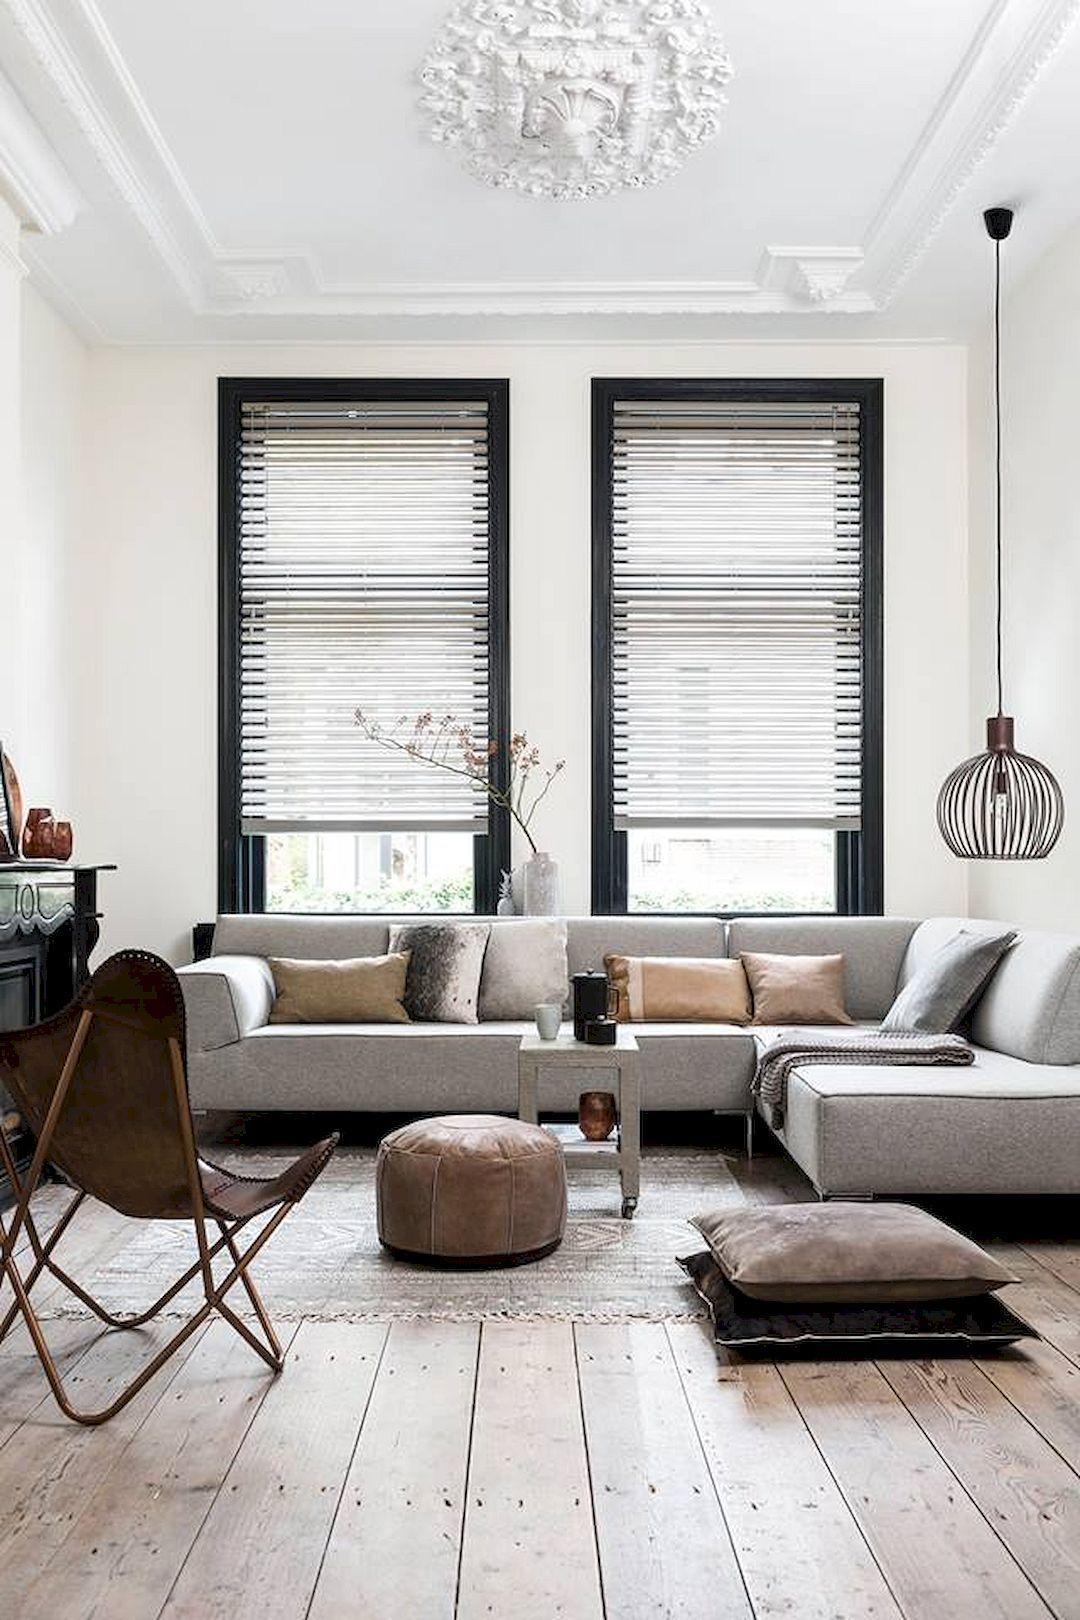 Charmant Best Interior Design Inspirations 2017 (155 Photos)  Https://www.futuristarchitecture.com/21867 Best Interior Designs.html